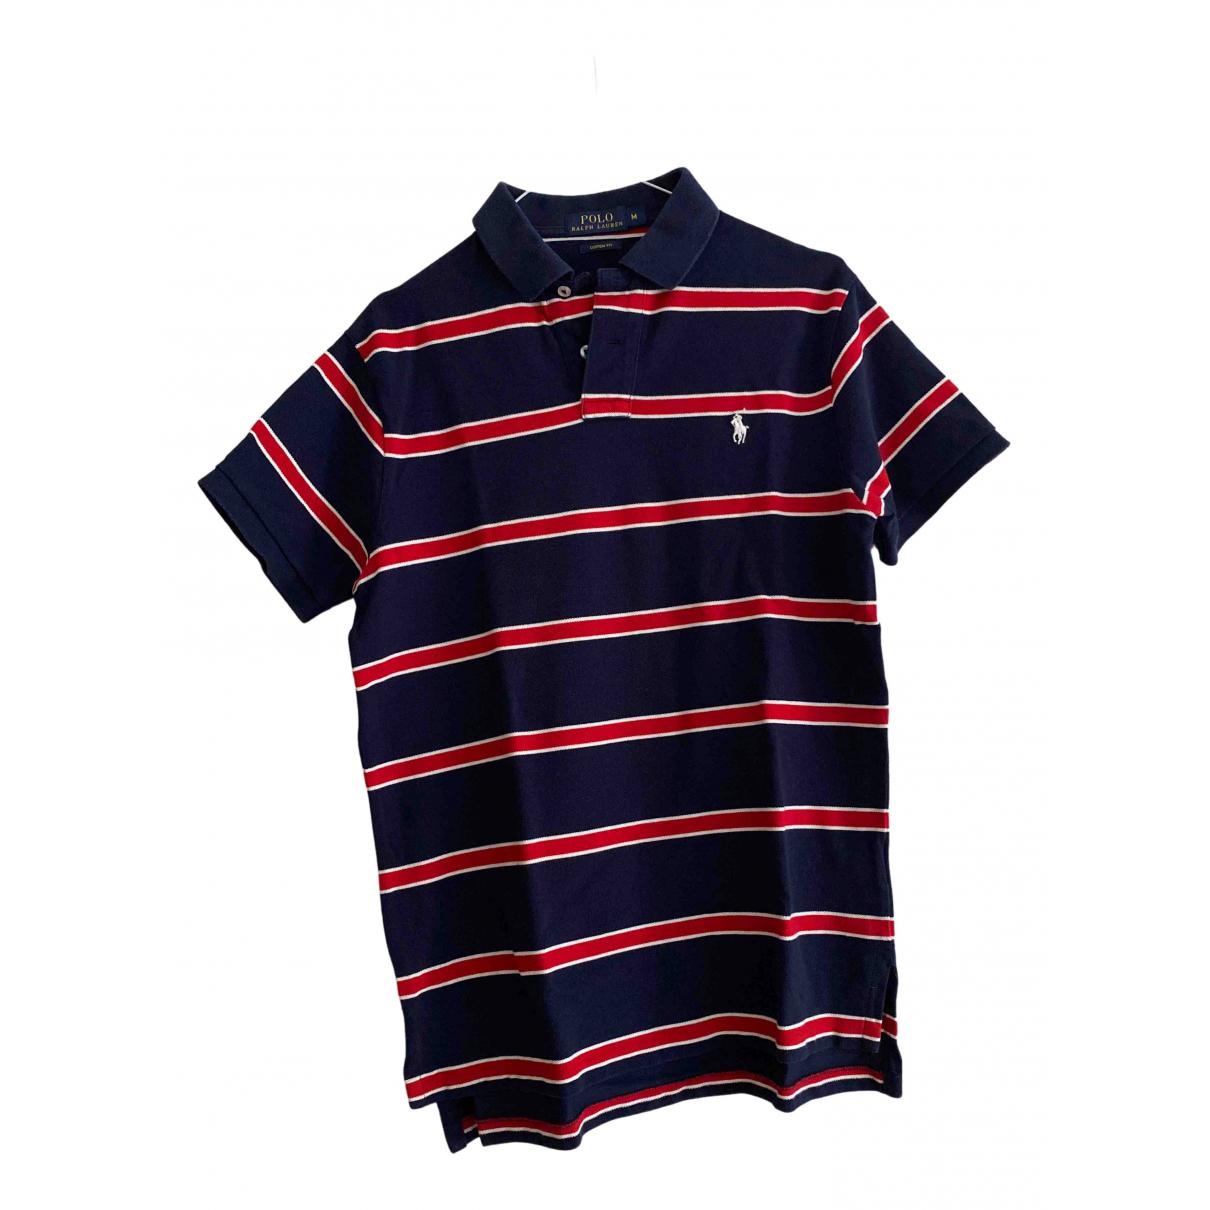 Polo Ralph Lauren - Polos Polo classique manches courtes pour homme en coton